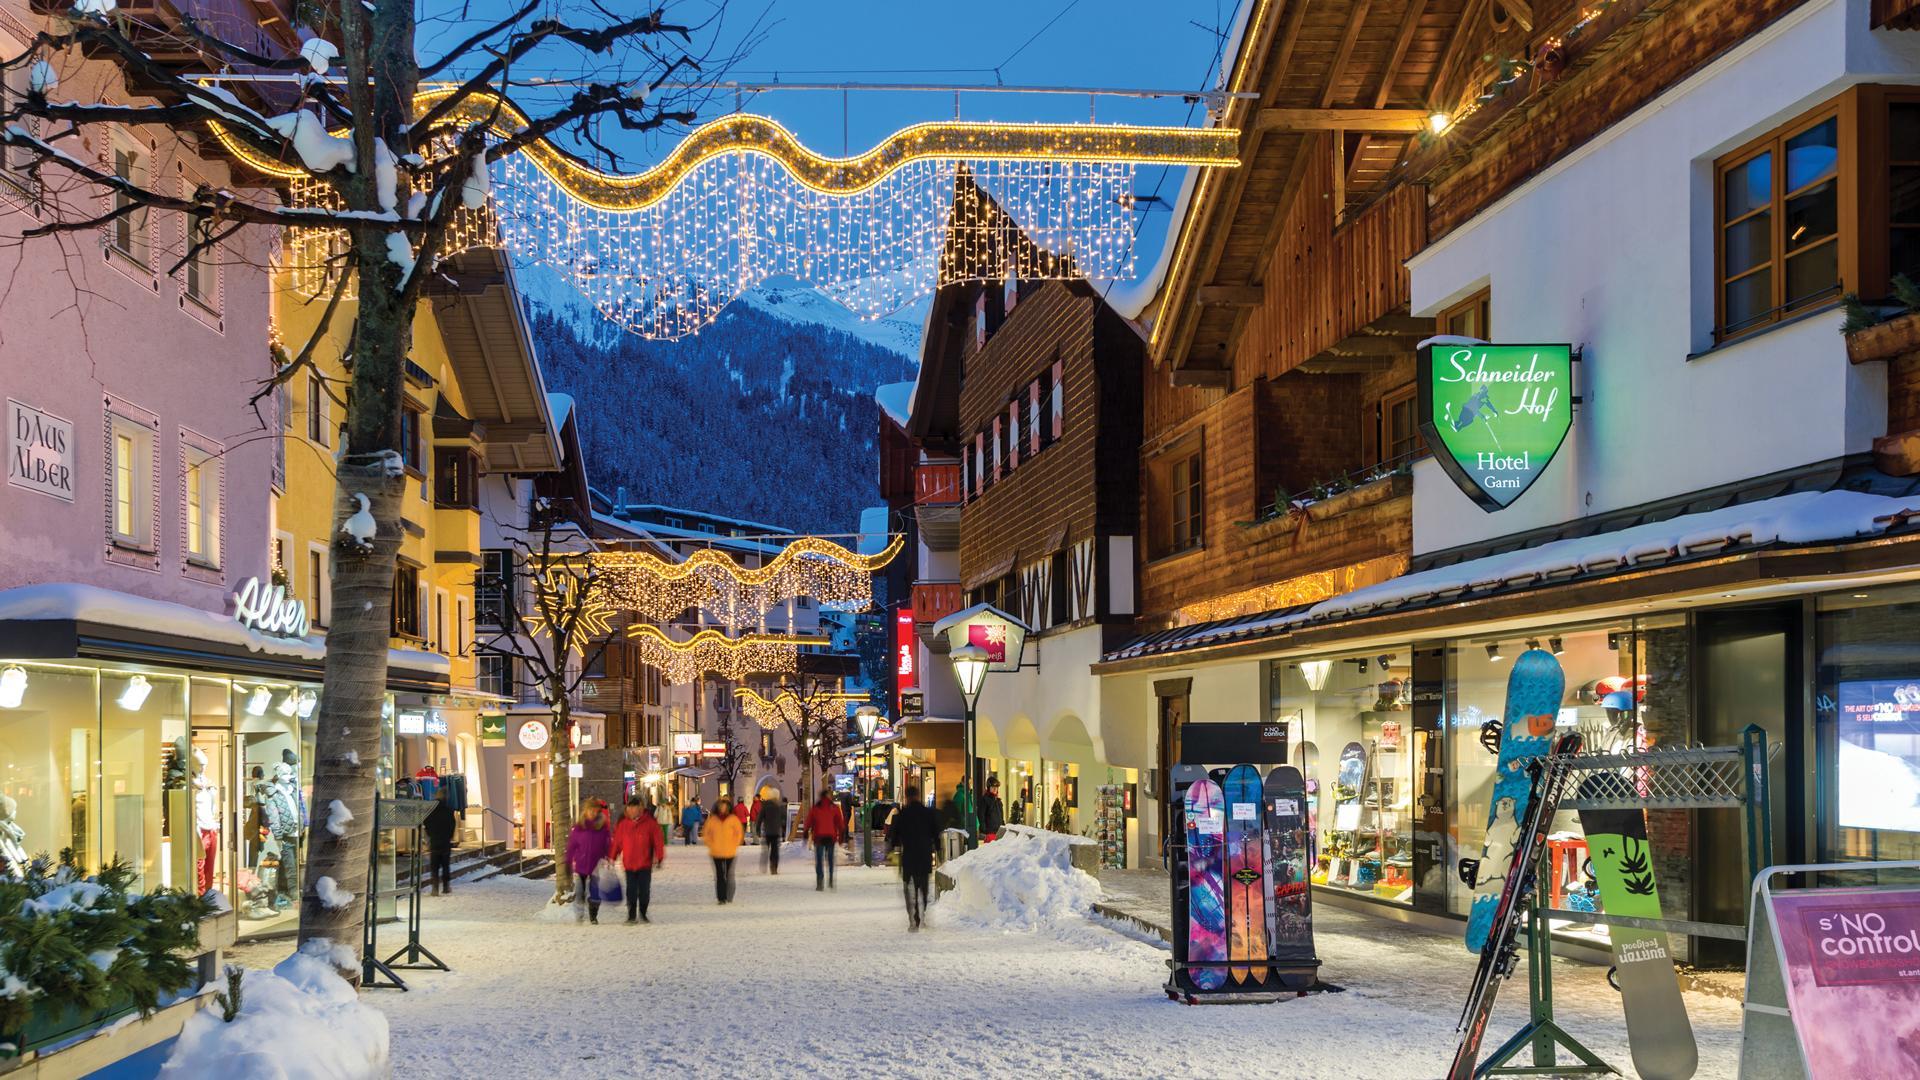 St. Anton, Austria